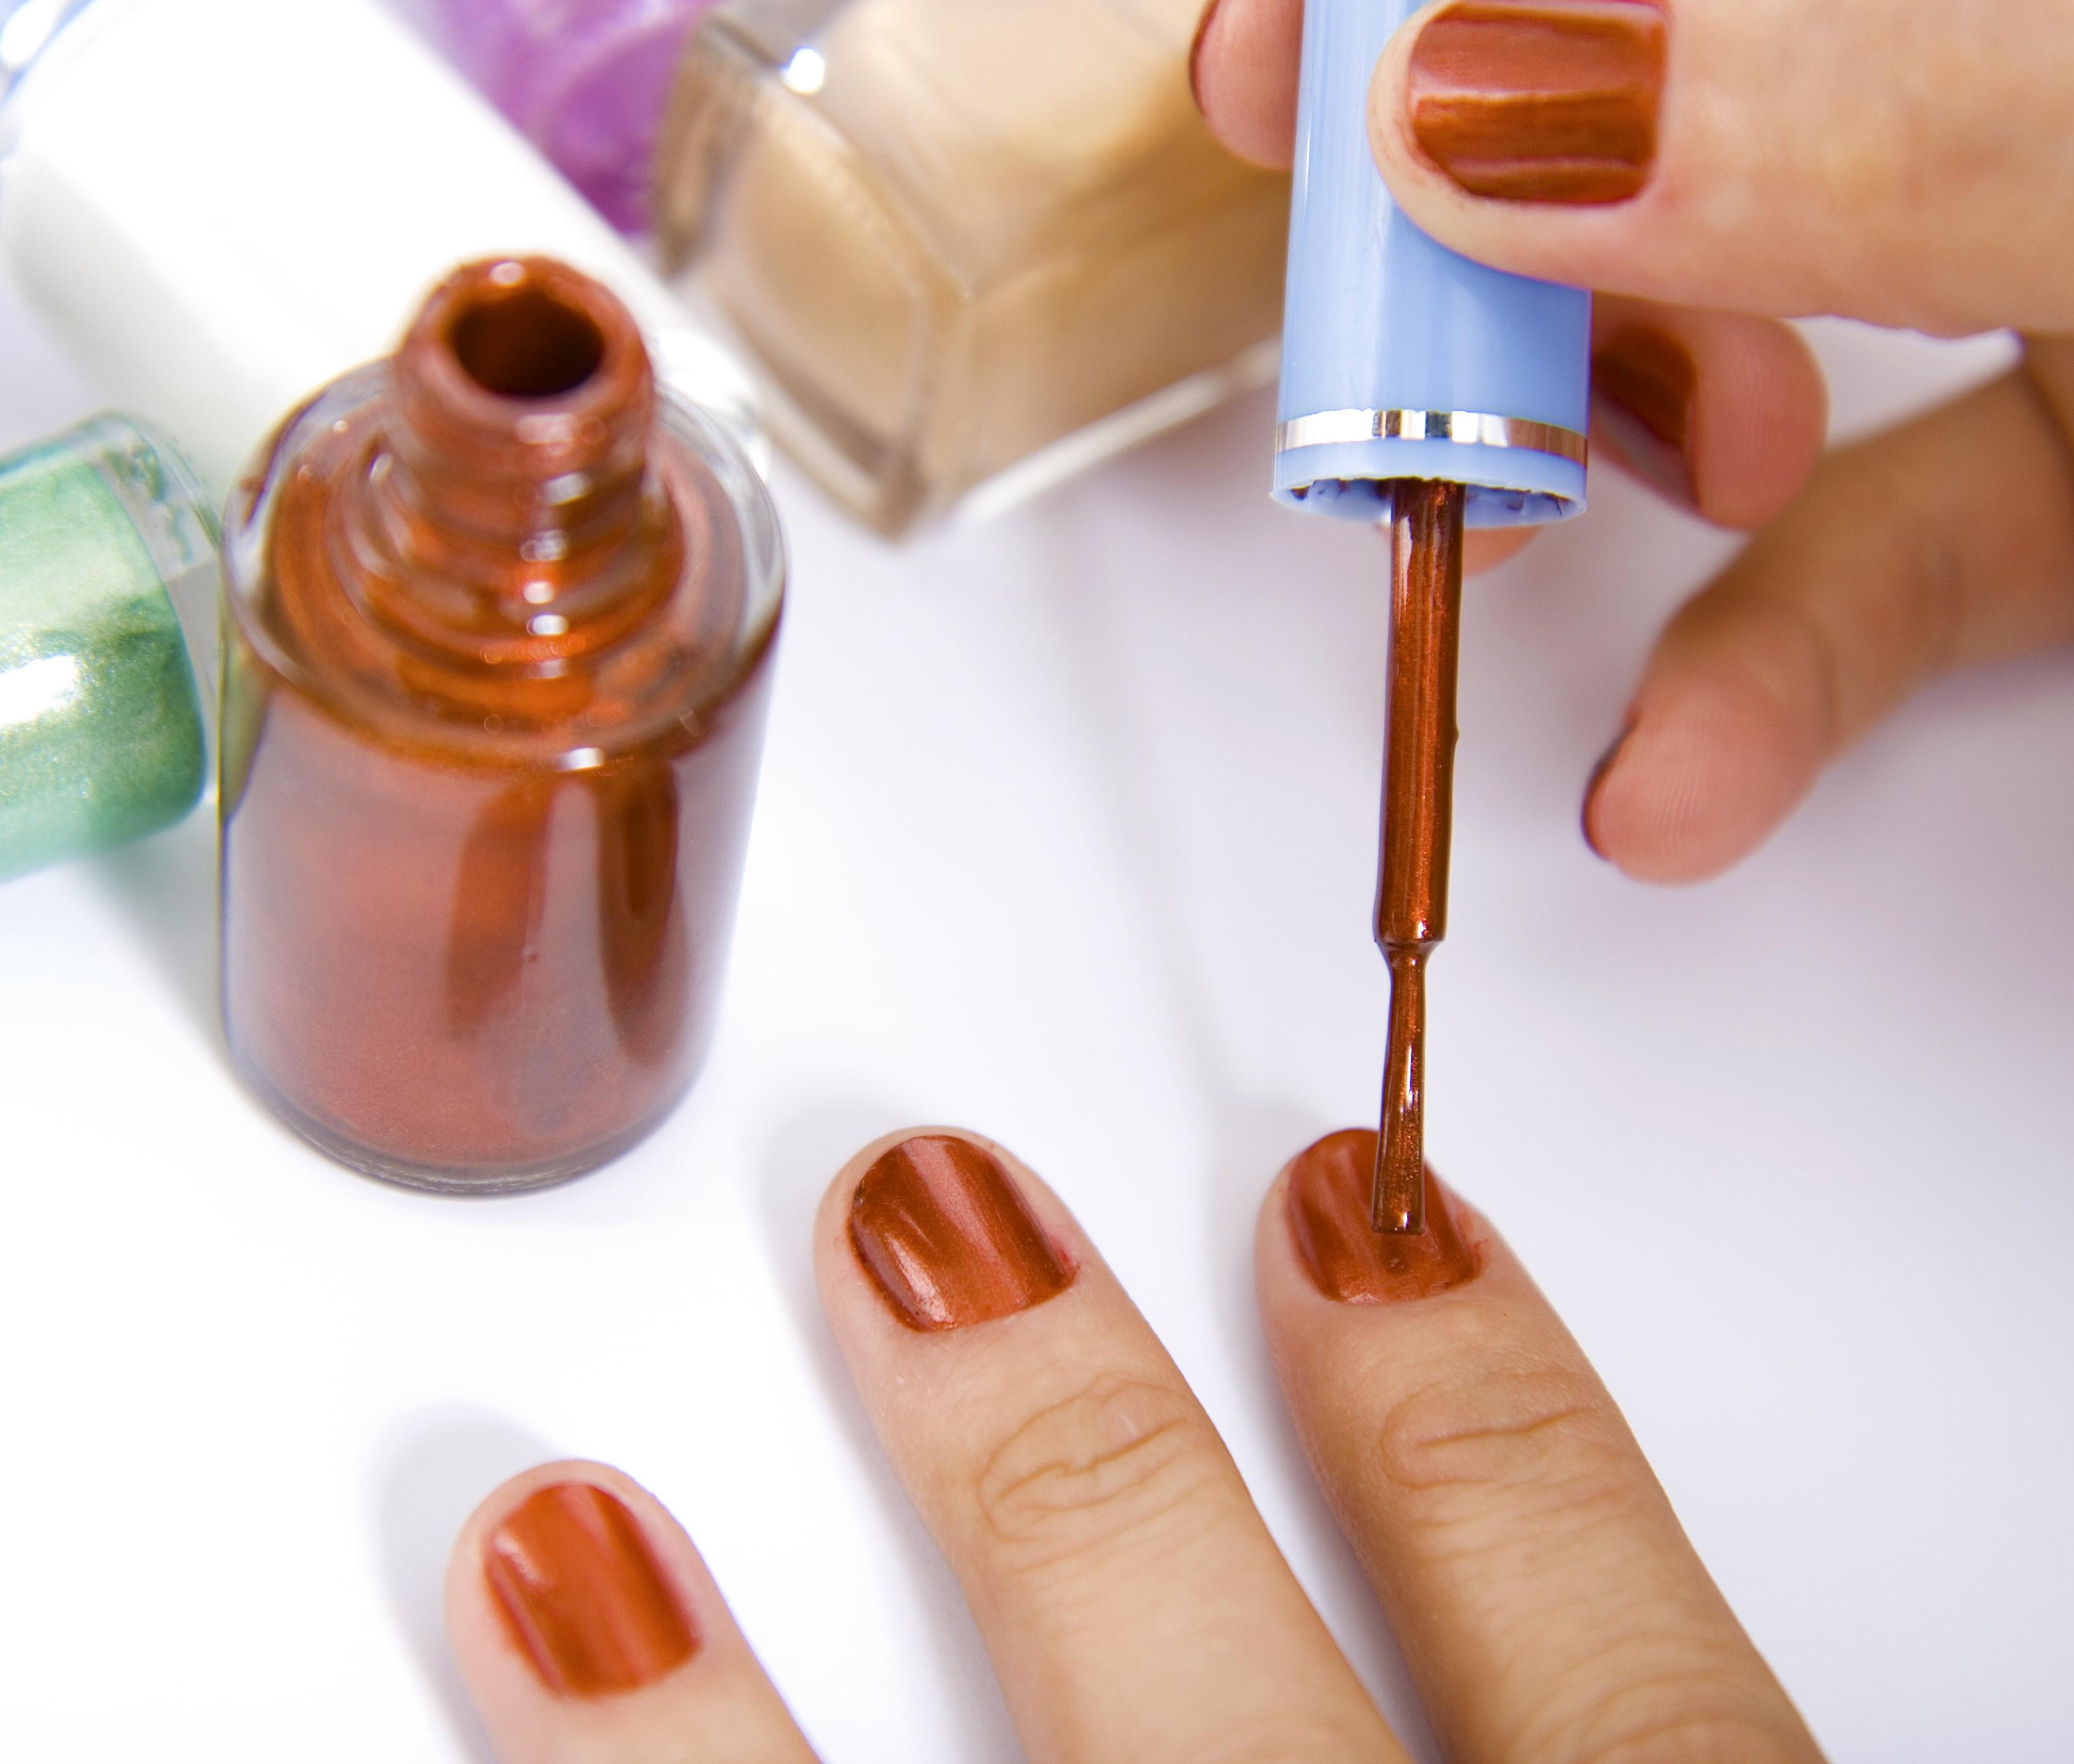 Brushing Nails with Nail Polish, Hands, Hand, Glamorous, Fingernails, HQ Photo